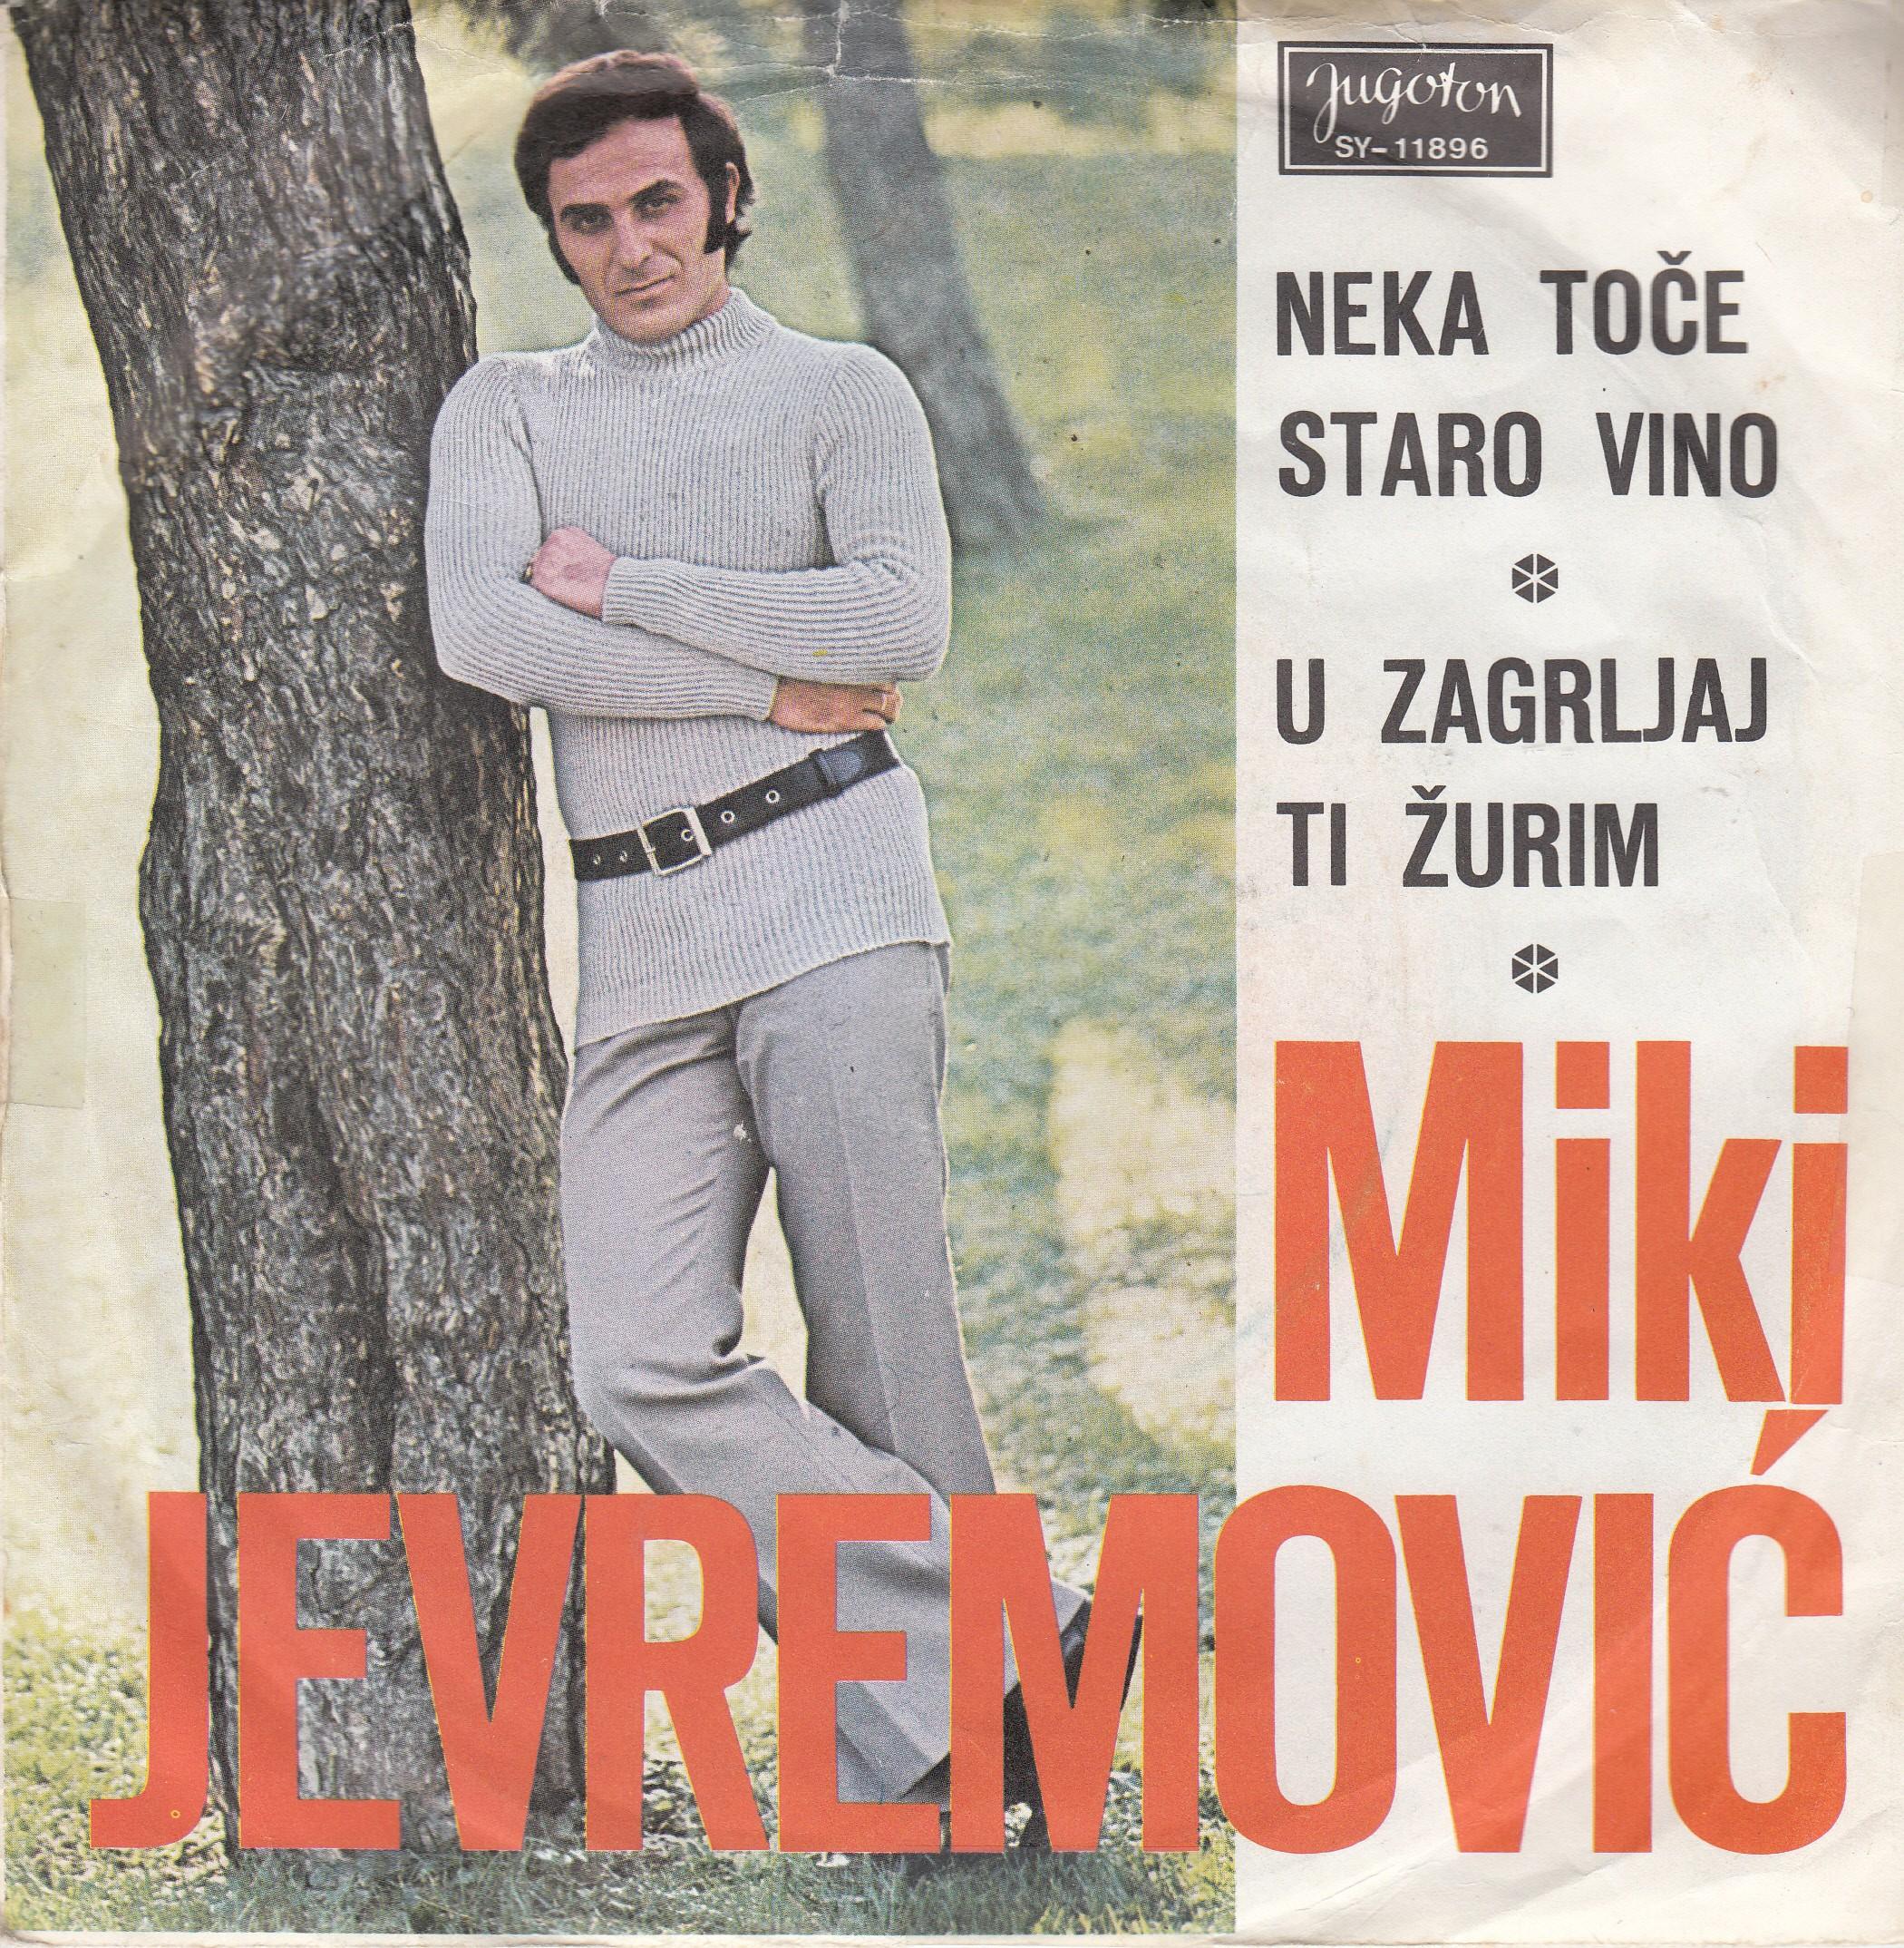 Jevremovic Miki - Neka Toce Staro Vino/u Zagrljaj Ti Zurim